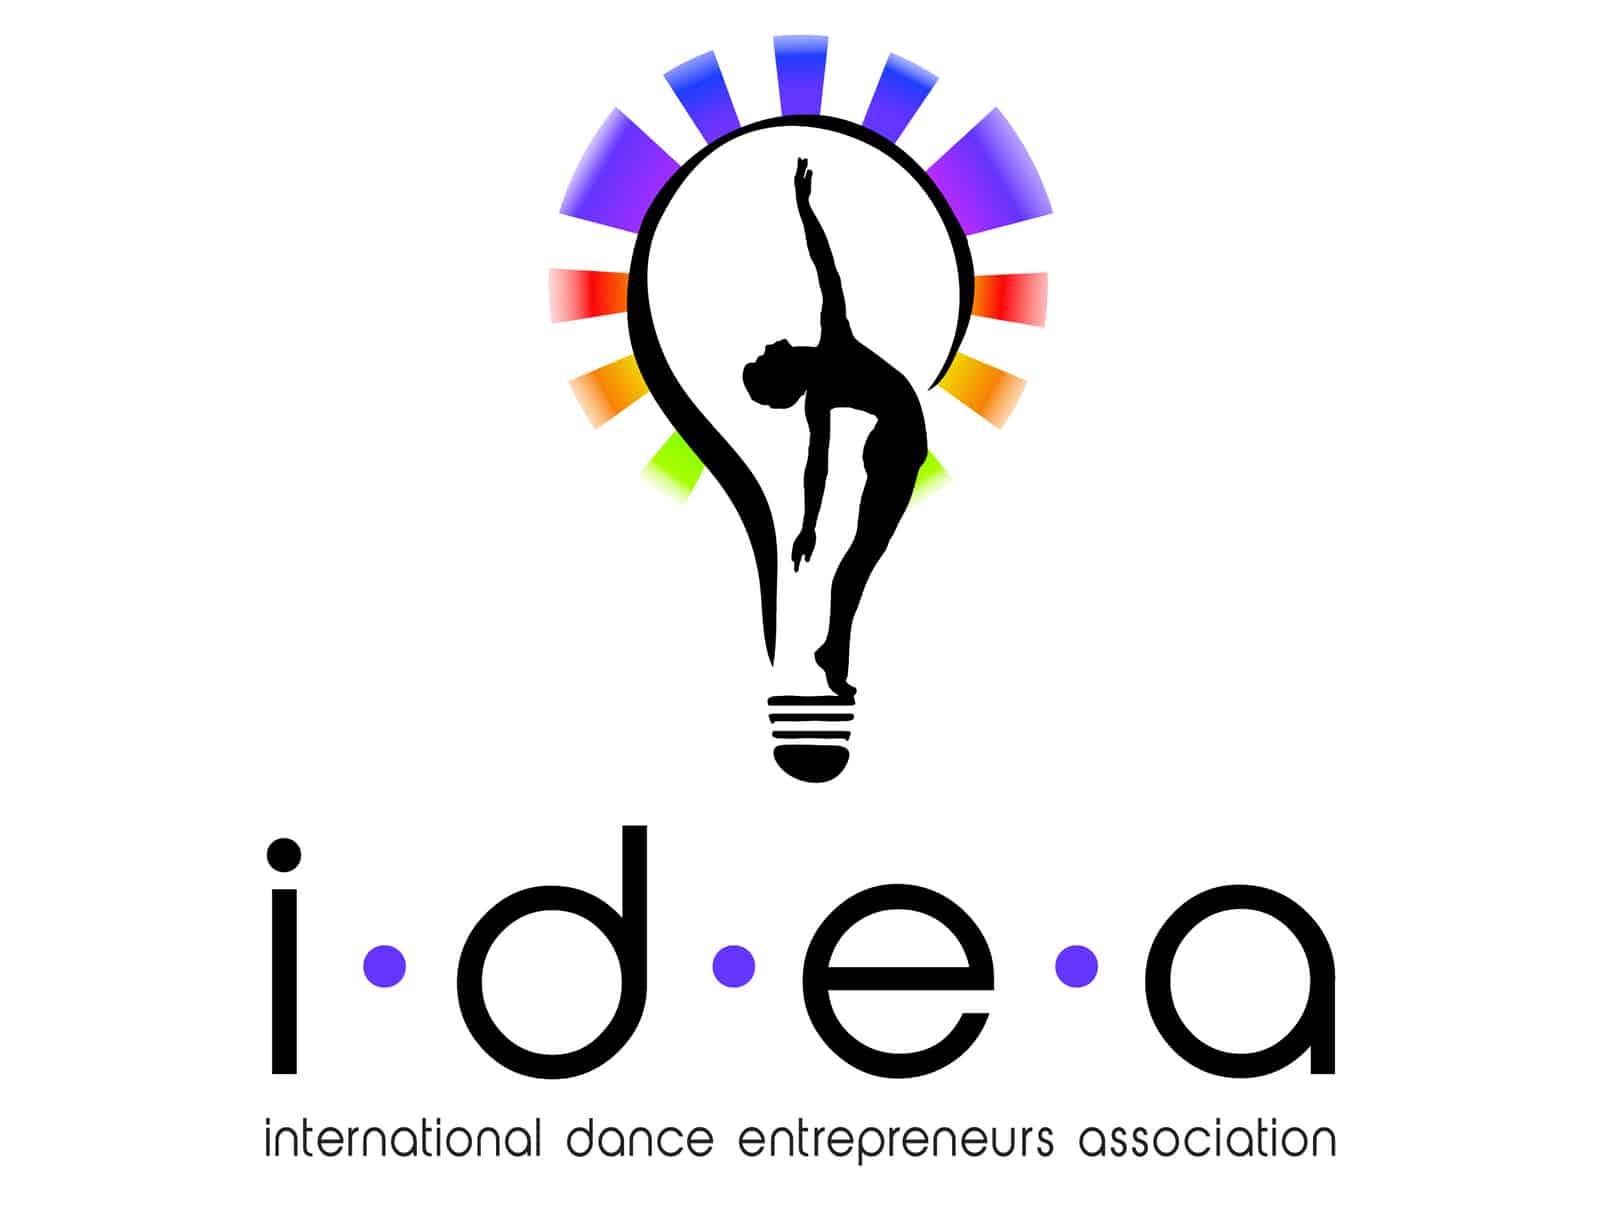 IDEA-Entrepreneurs-Vert-High-Res-WATERMARK.jpg